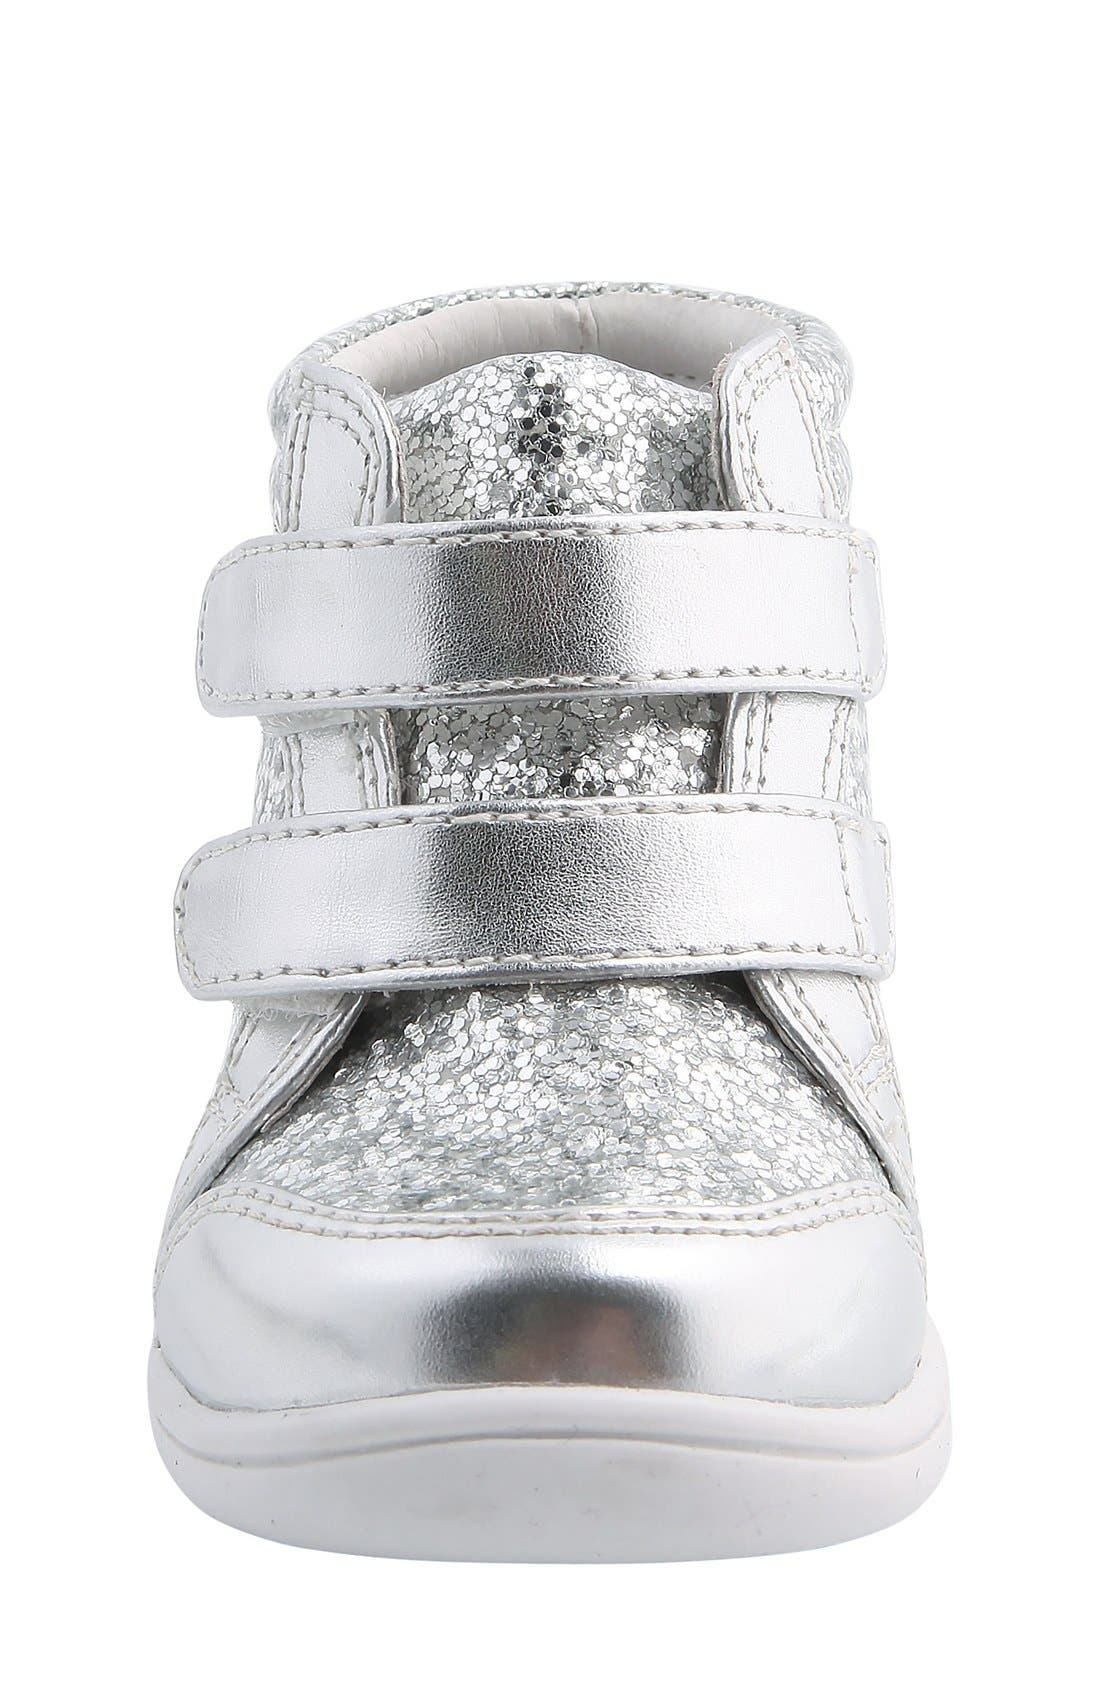 Nina 'Stardust' Metallic High Top Sneaker,                             Alternate thumbnail 5, color,                             047